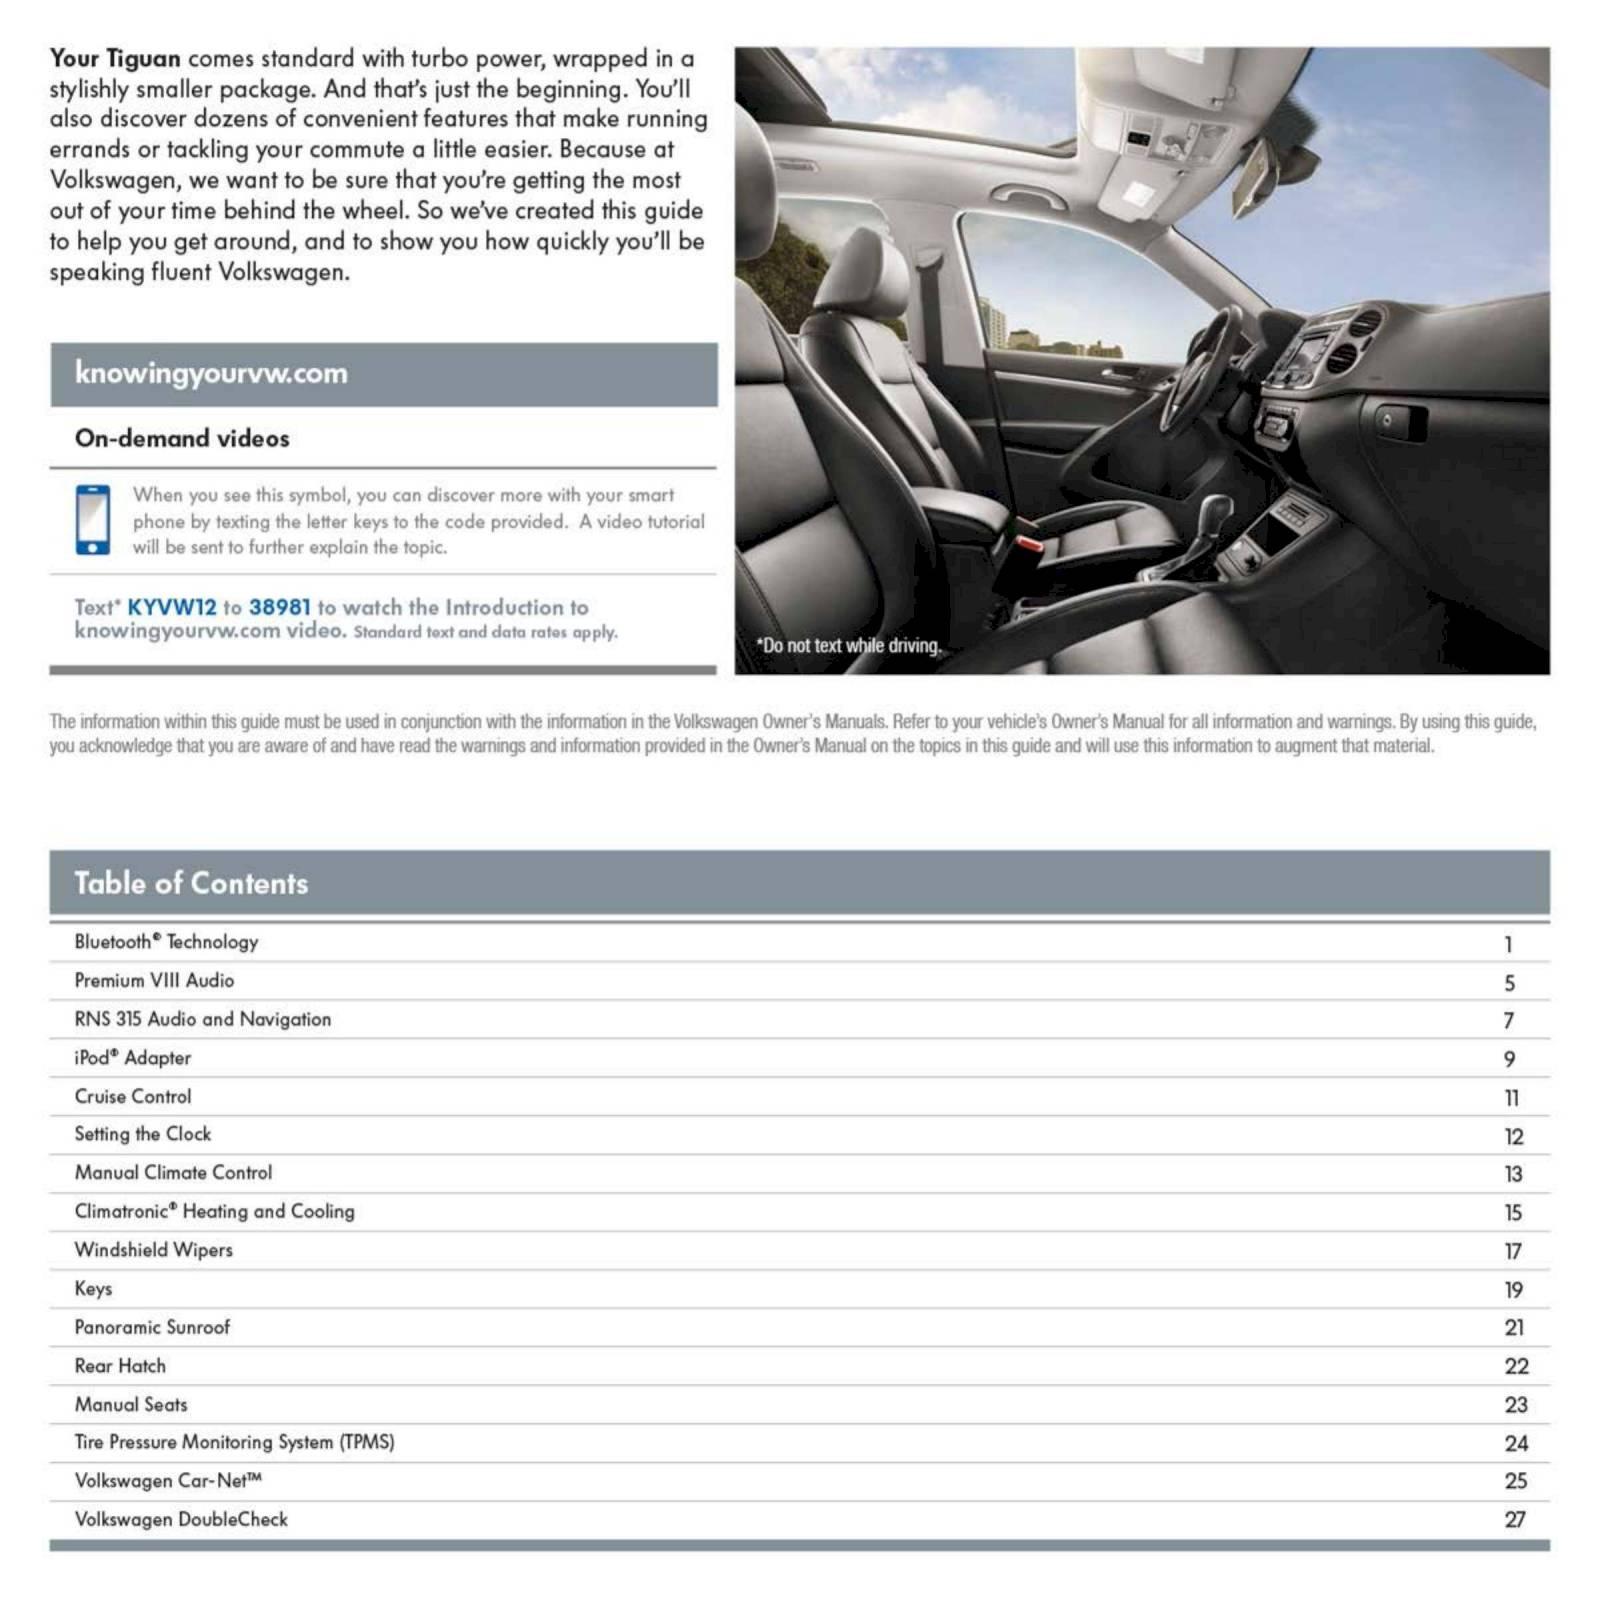 Honda Genuine 08F02-SWA-04005 Tailgate Cover Spoiler